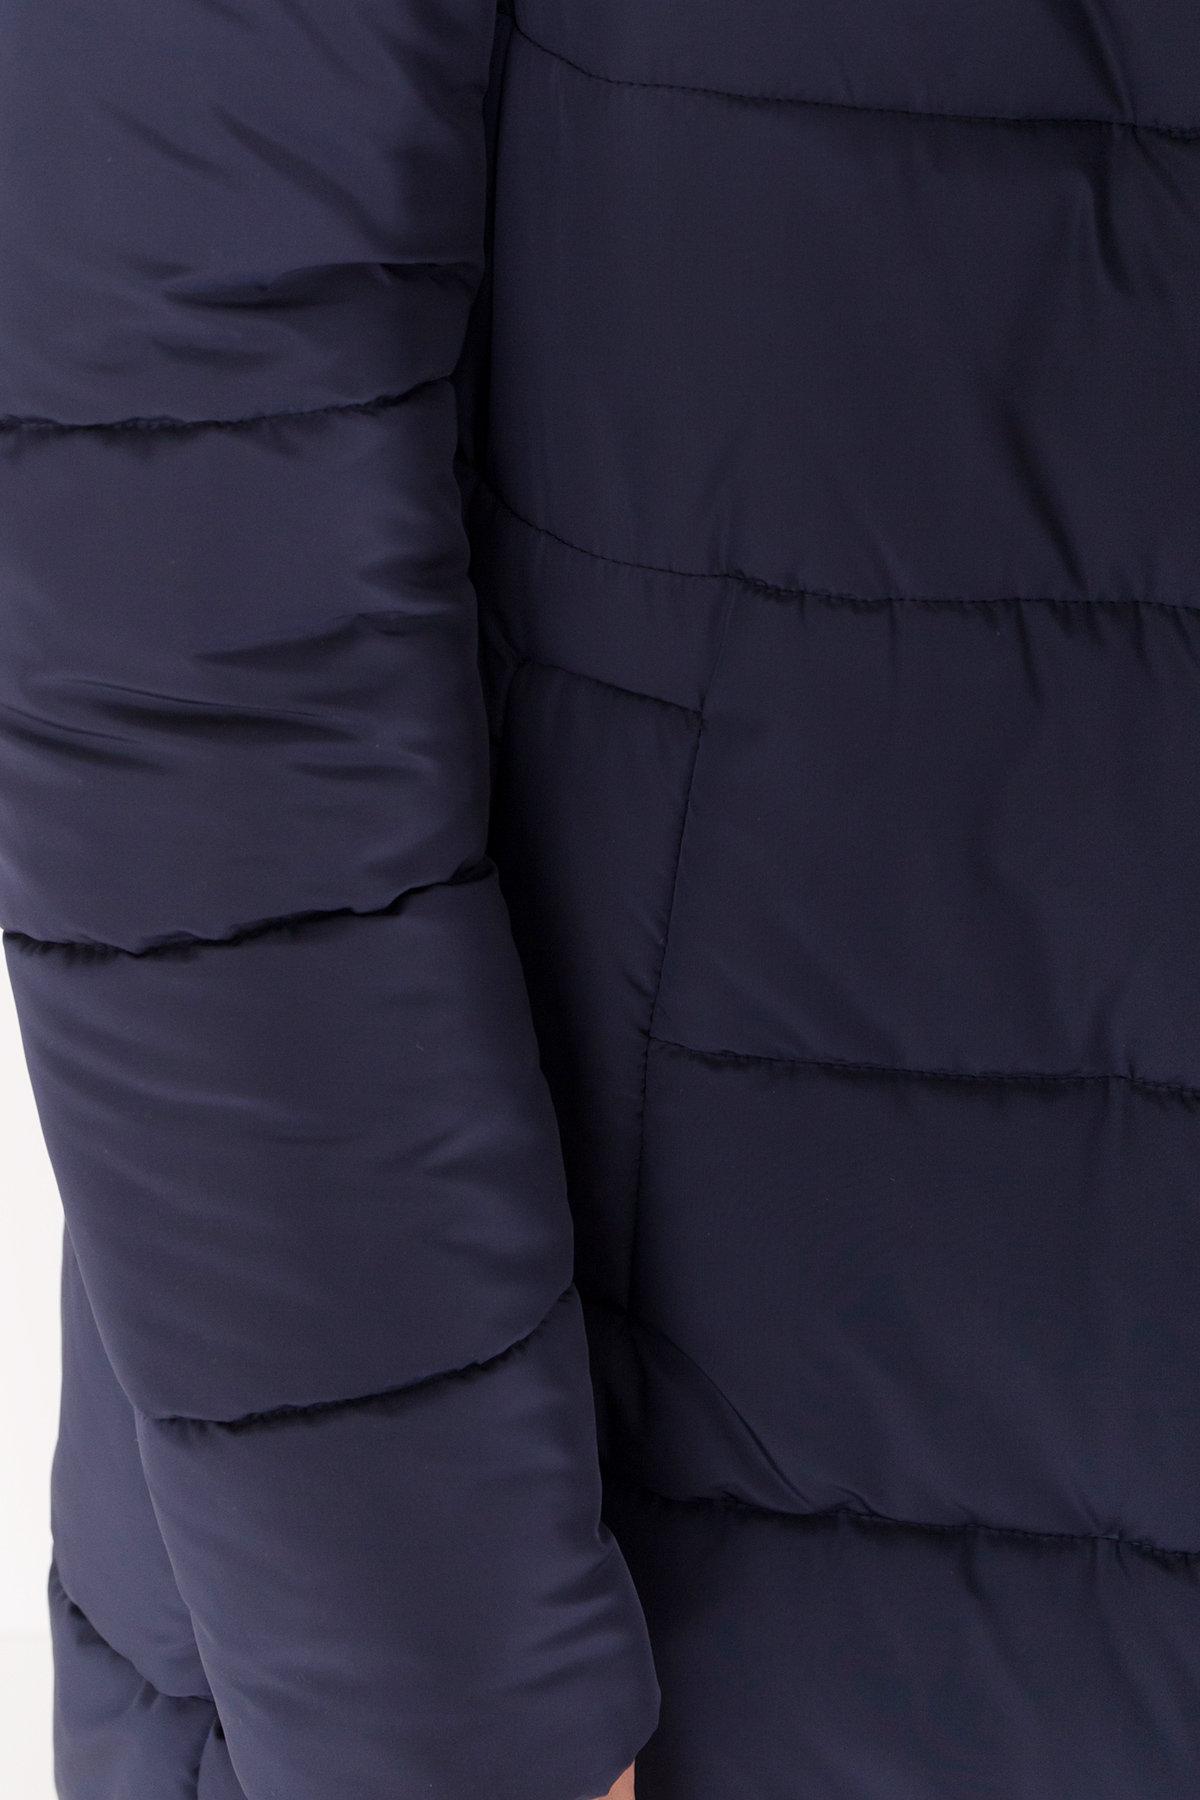 Длинный пуховик зимний Сигма Канада 8230 АРТ. 44269 Цвет: т. синий - фото 5, интернет магазин tm-modus.ru